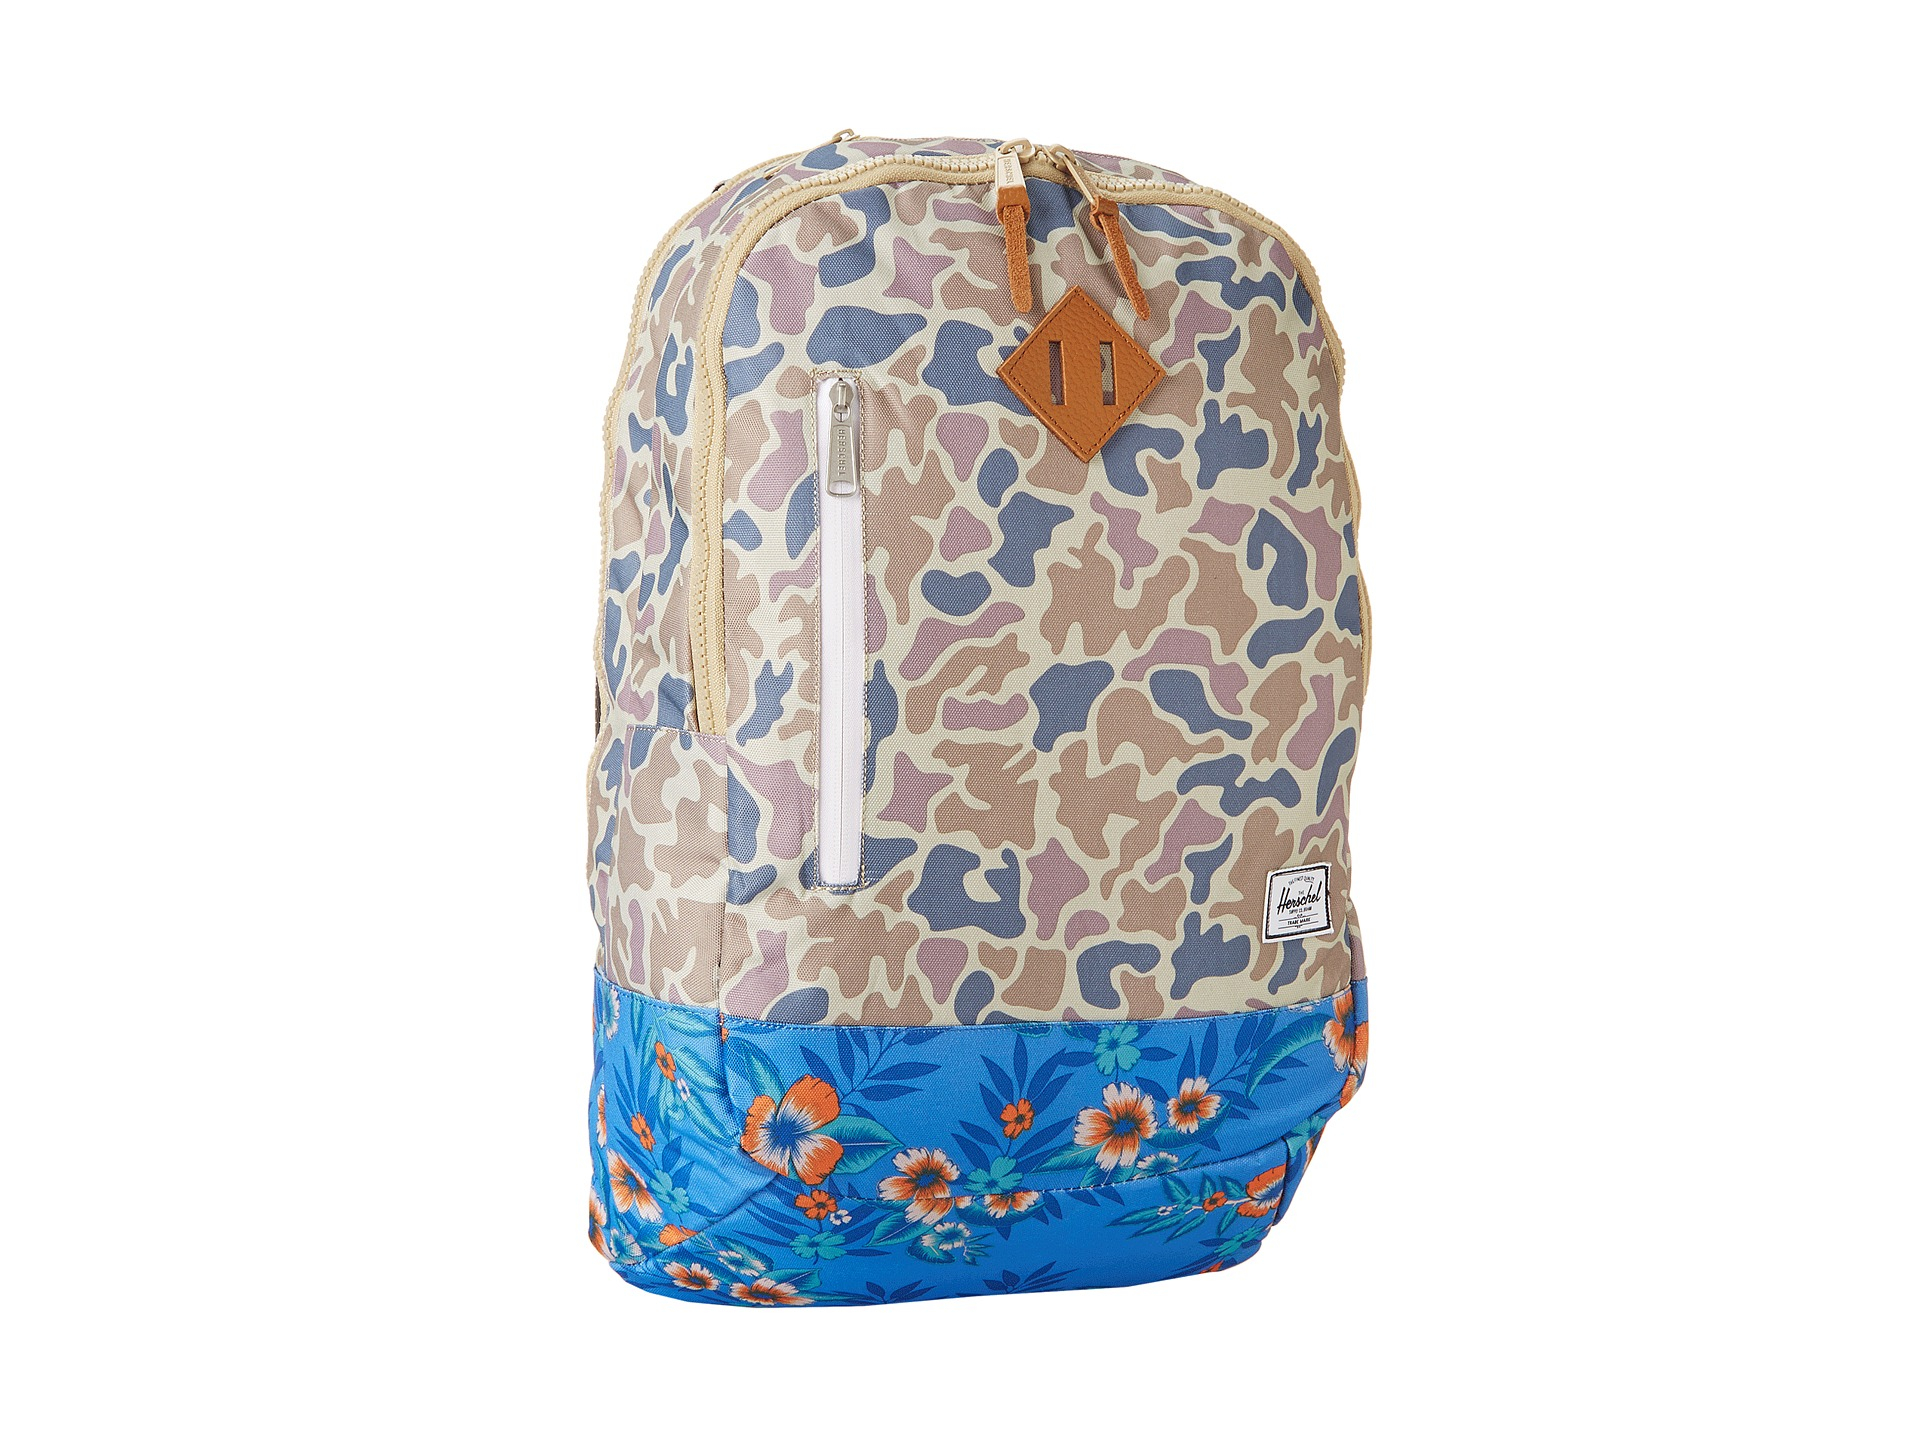 Herschel Supply Co Camouflage Village Backpack  cd1992e50a022